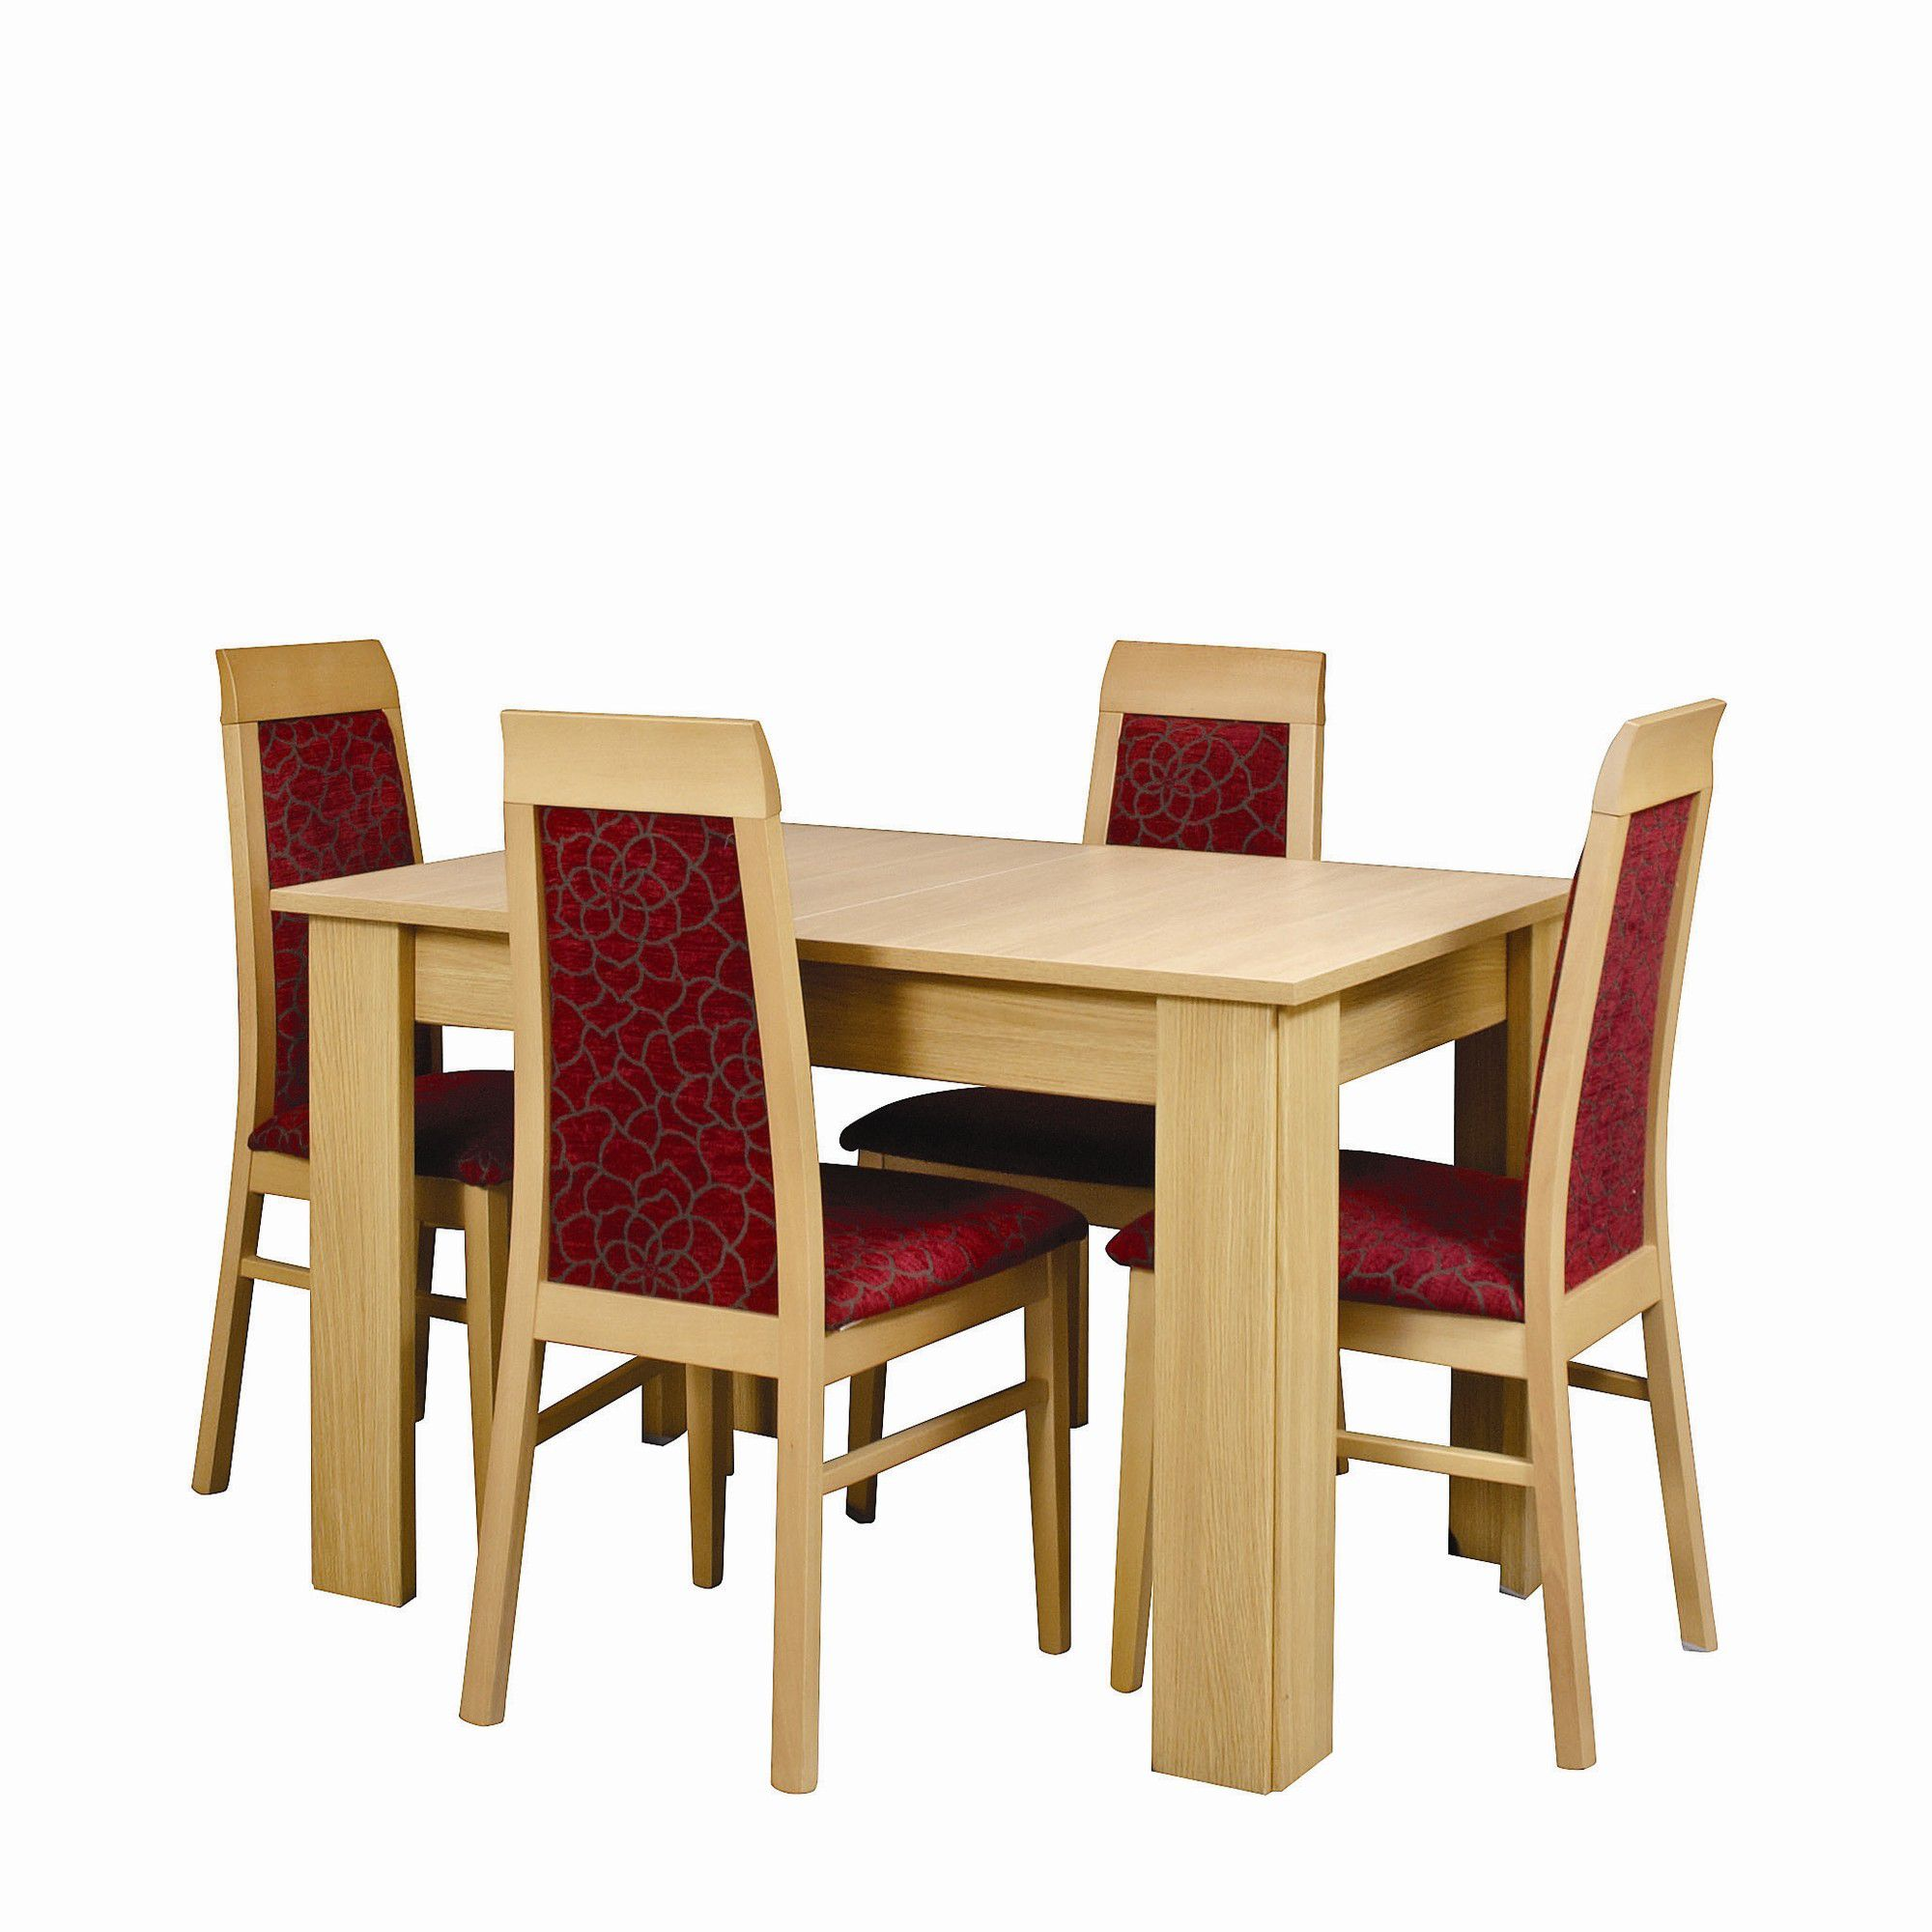 Extending Table 187 Tesco Extending Tables : 444 2778PI1000015MNwid2000amphei2000 from extendingtable.co.uk size 2000 x 2000 jpeg 235kB